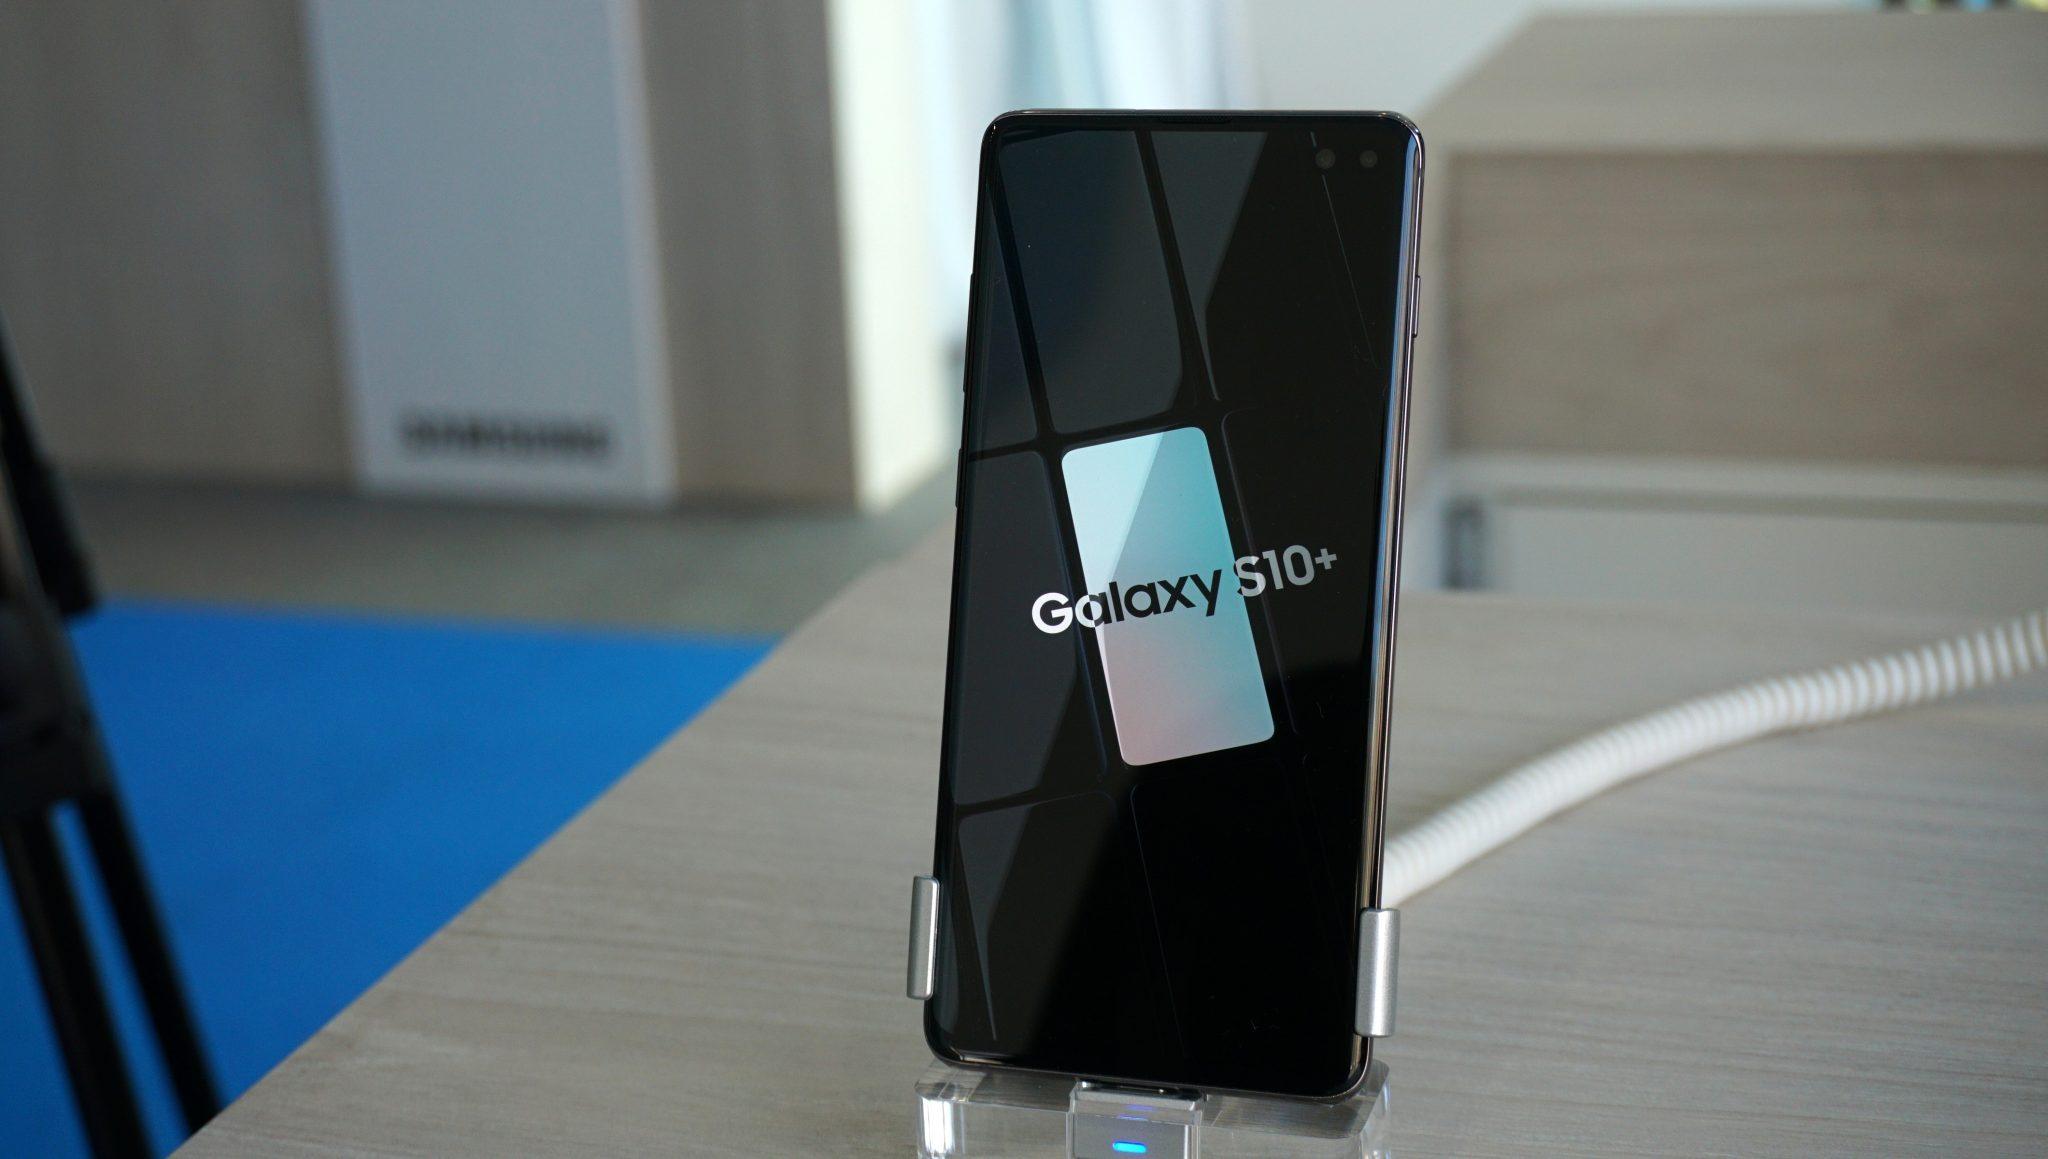 5g compatible phones